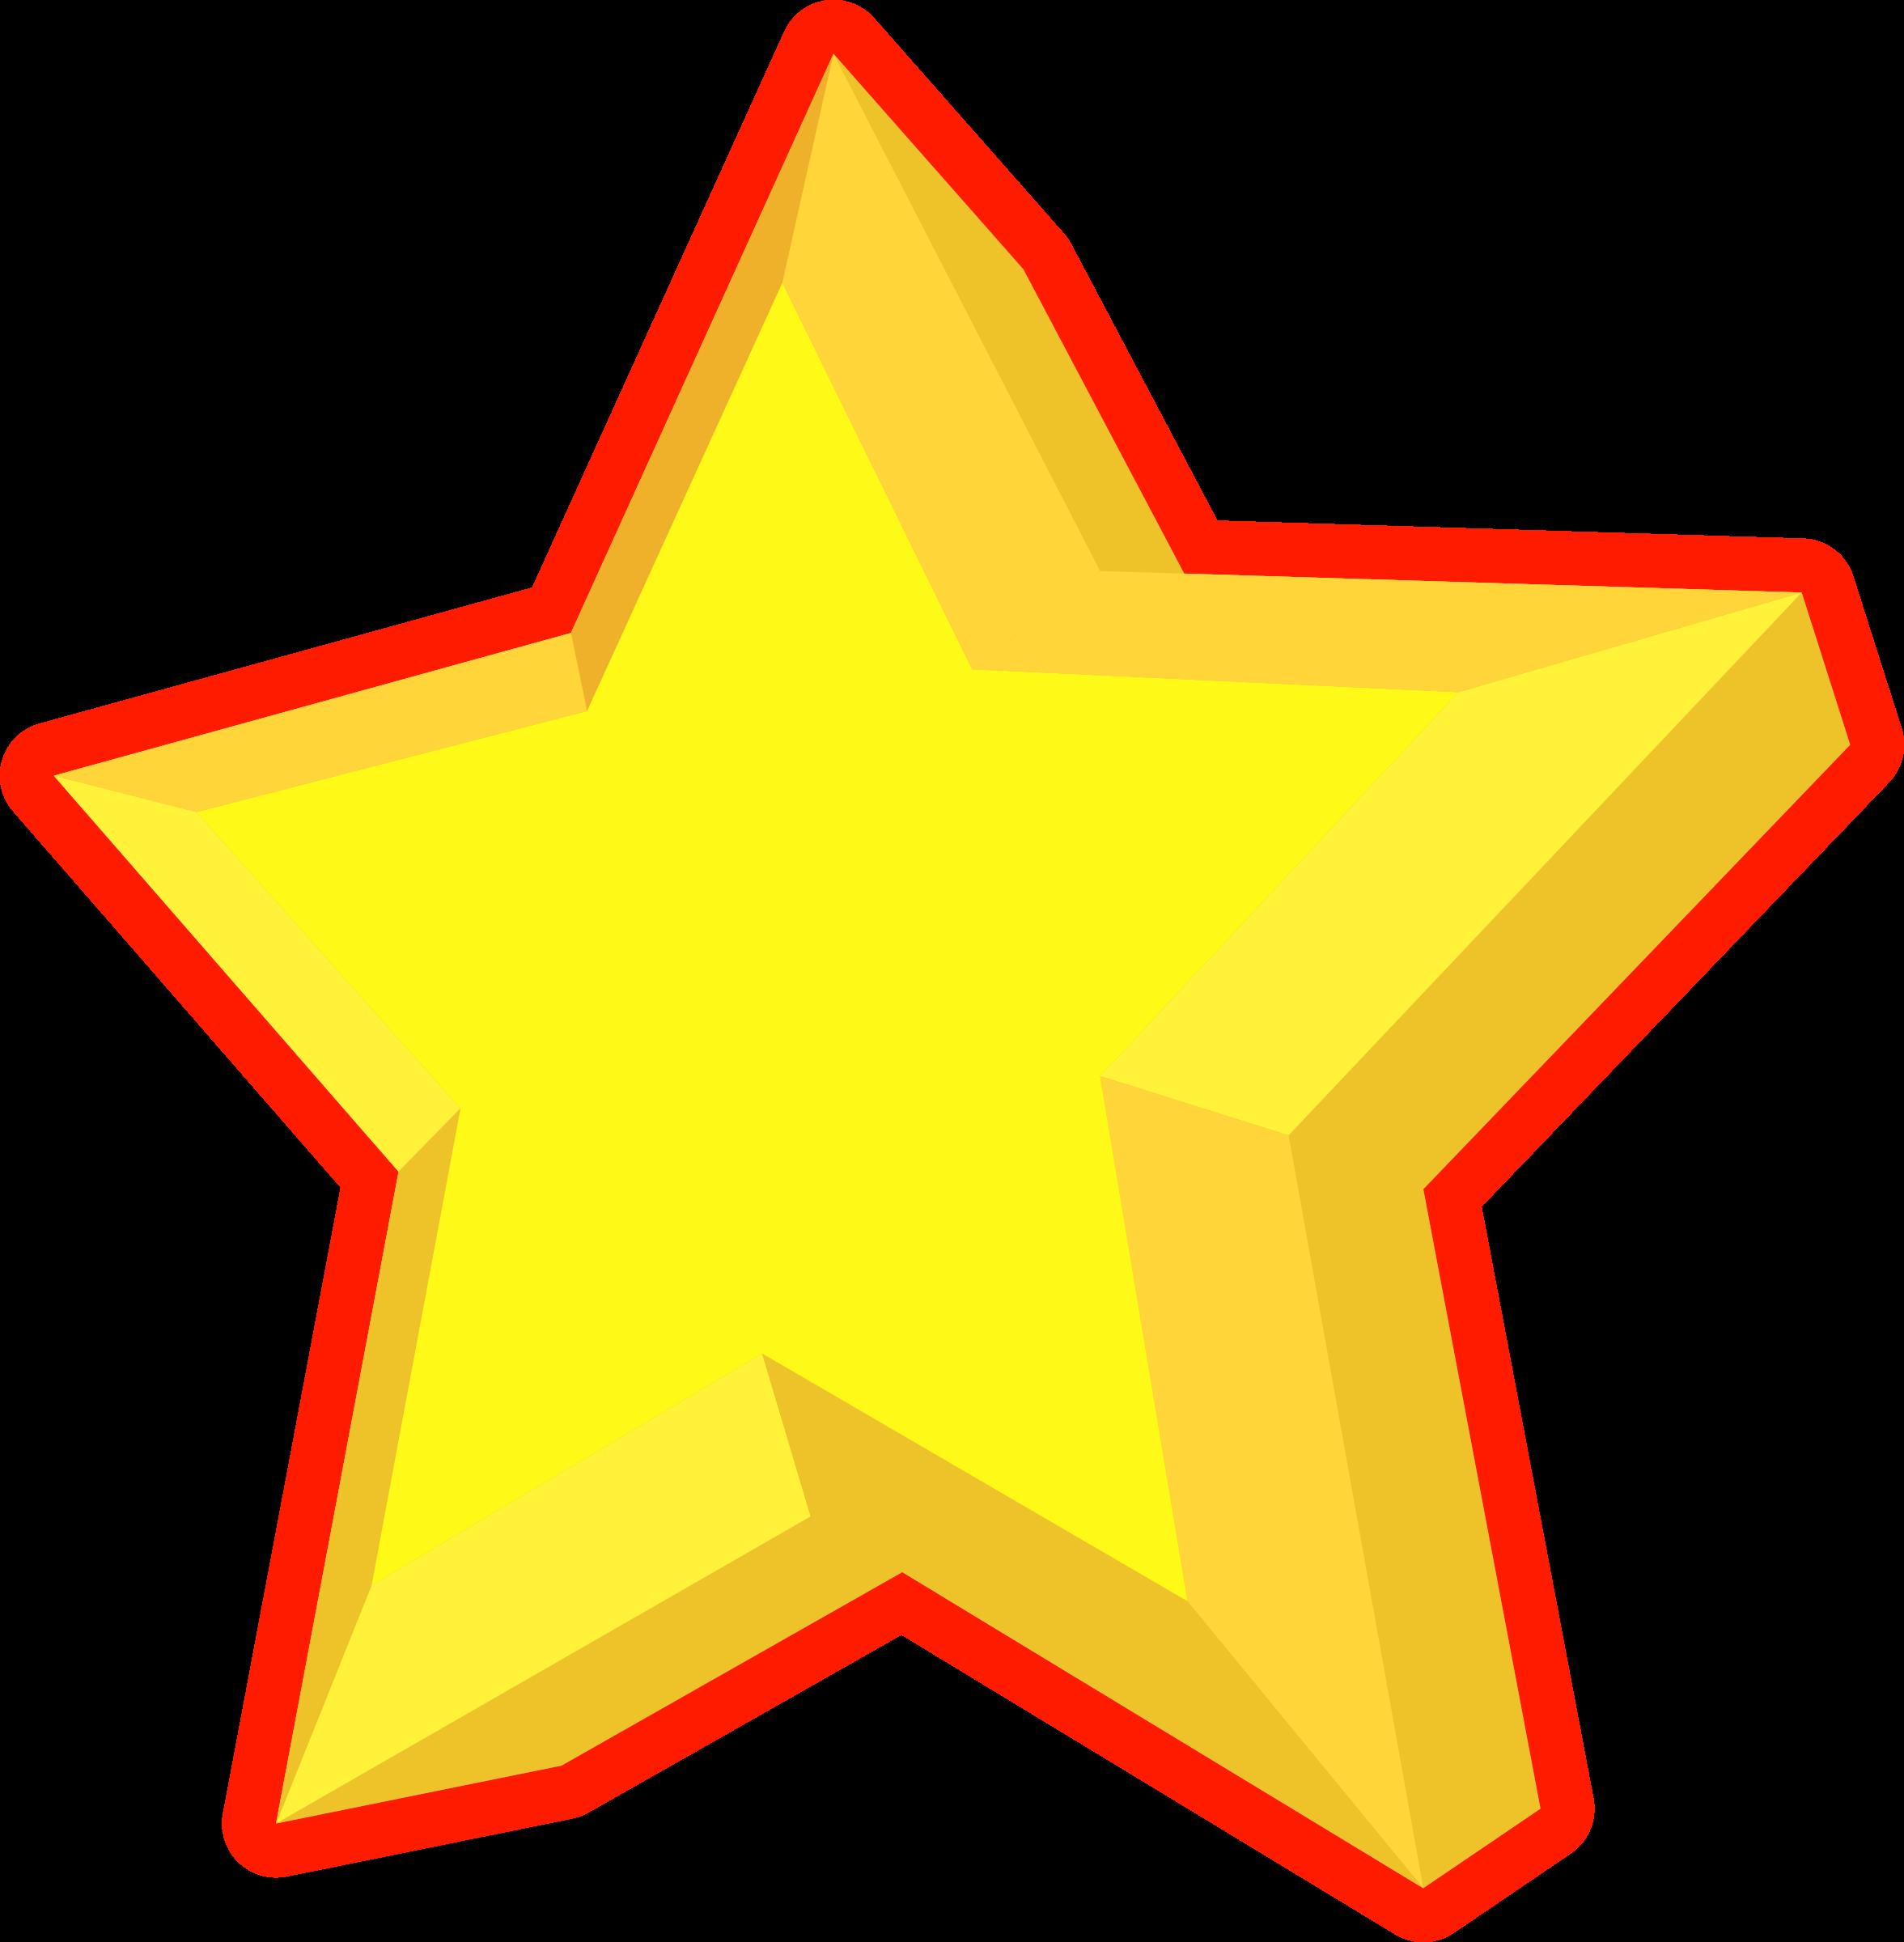 Clipart star reward. Simple d big image